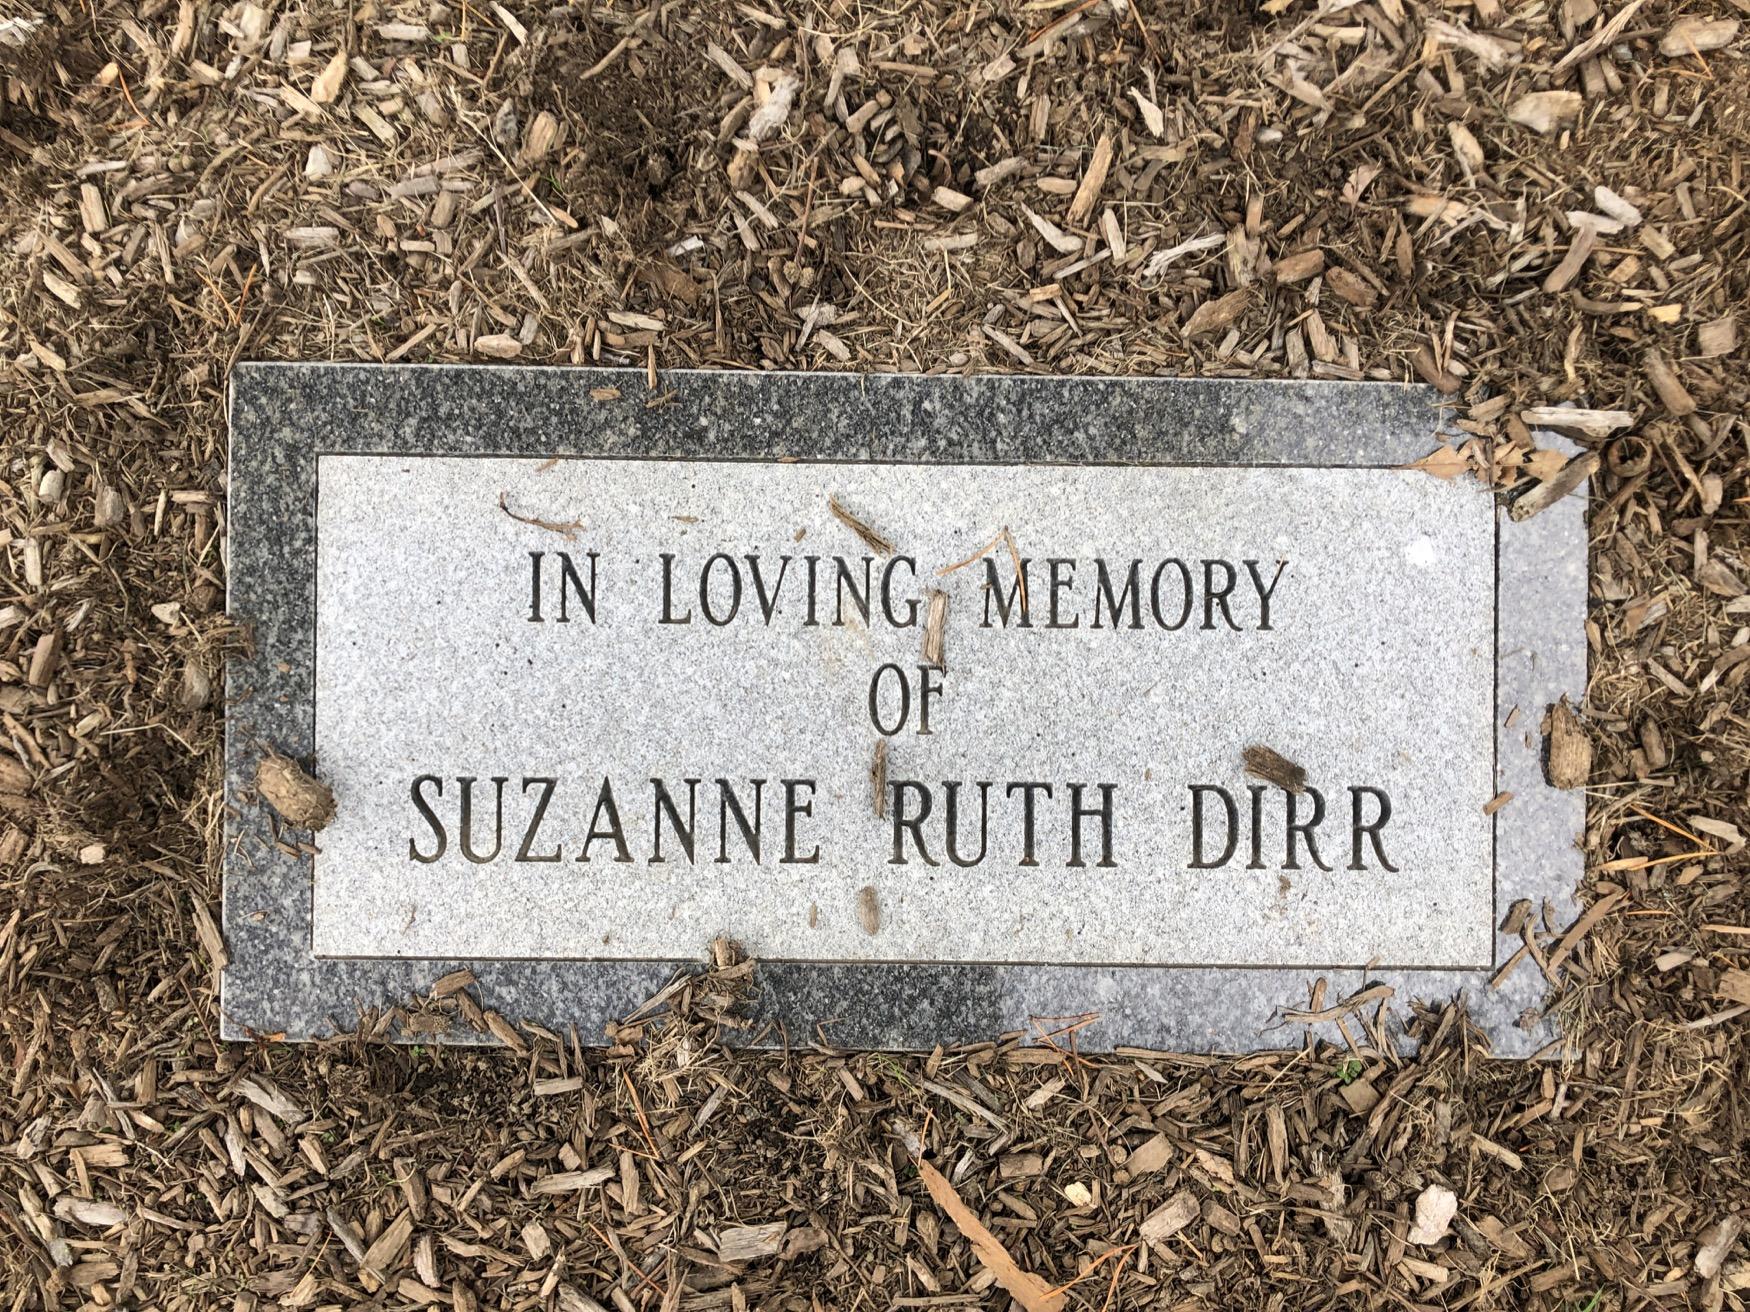 Suzanne Ruth Dirr Plaque